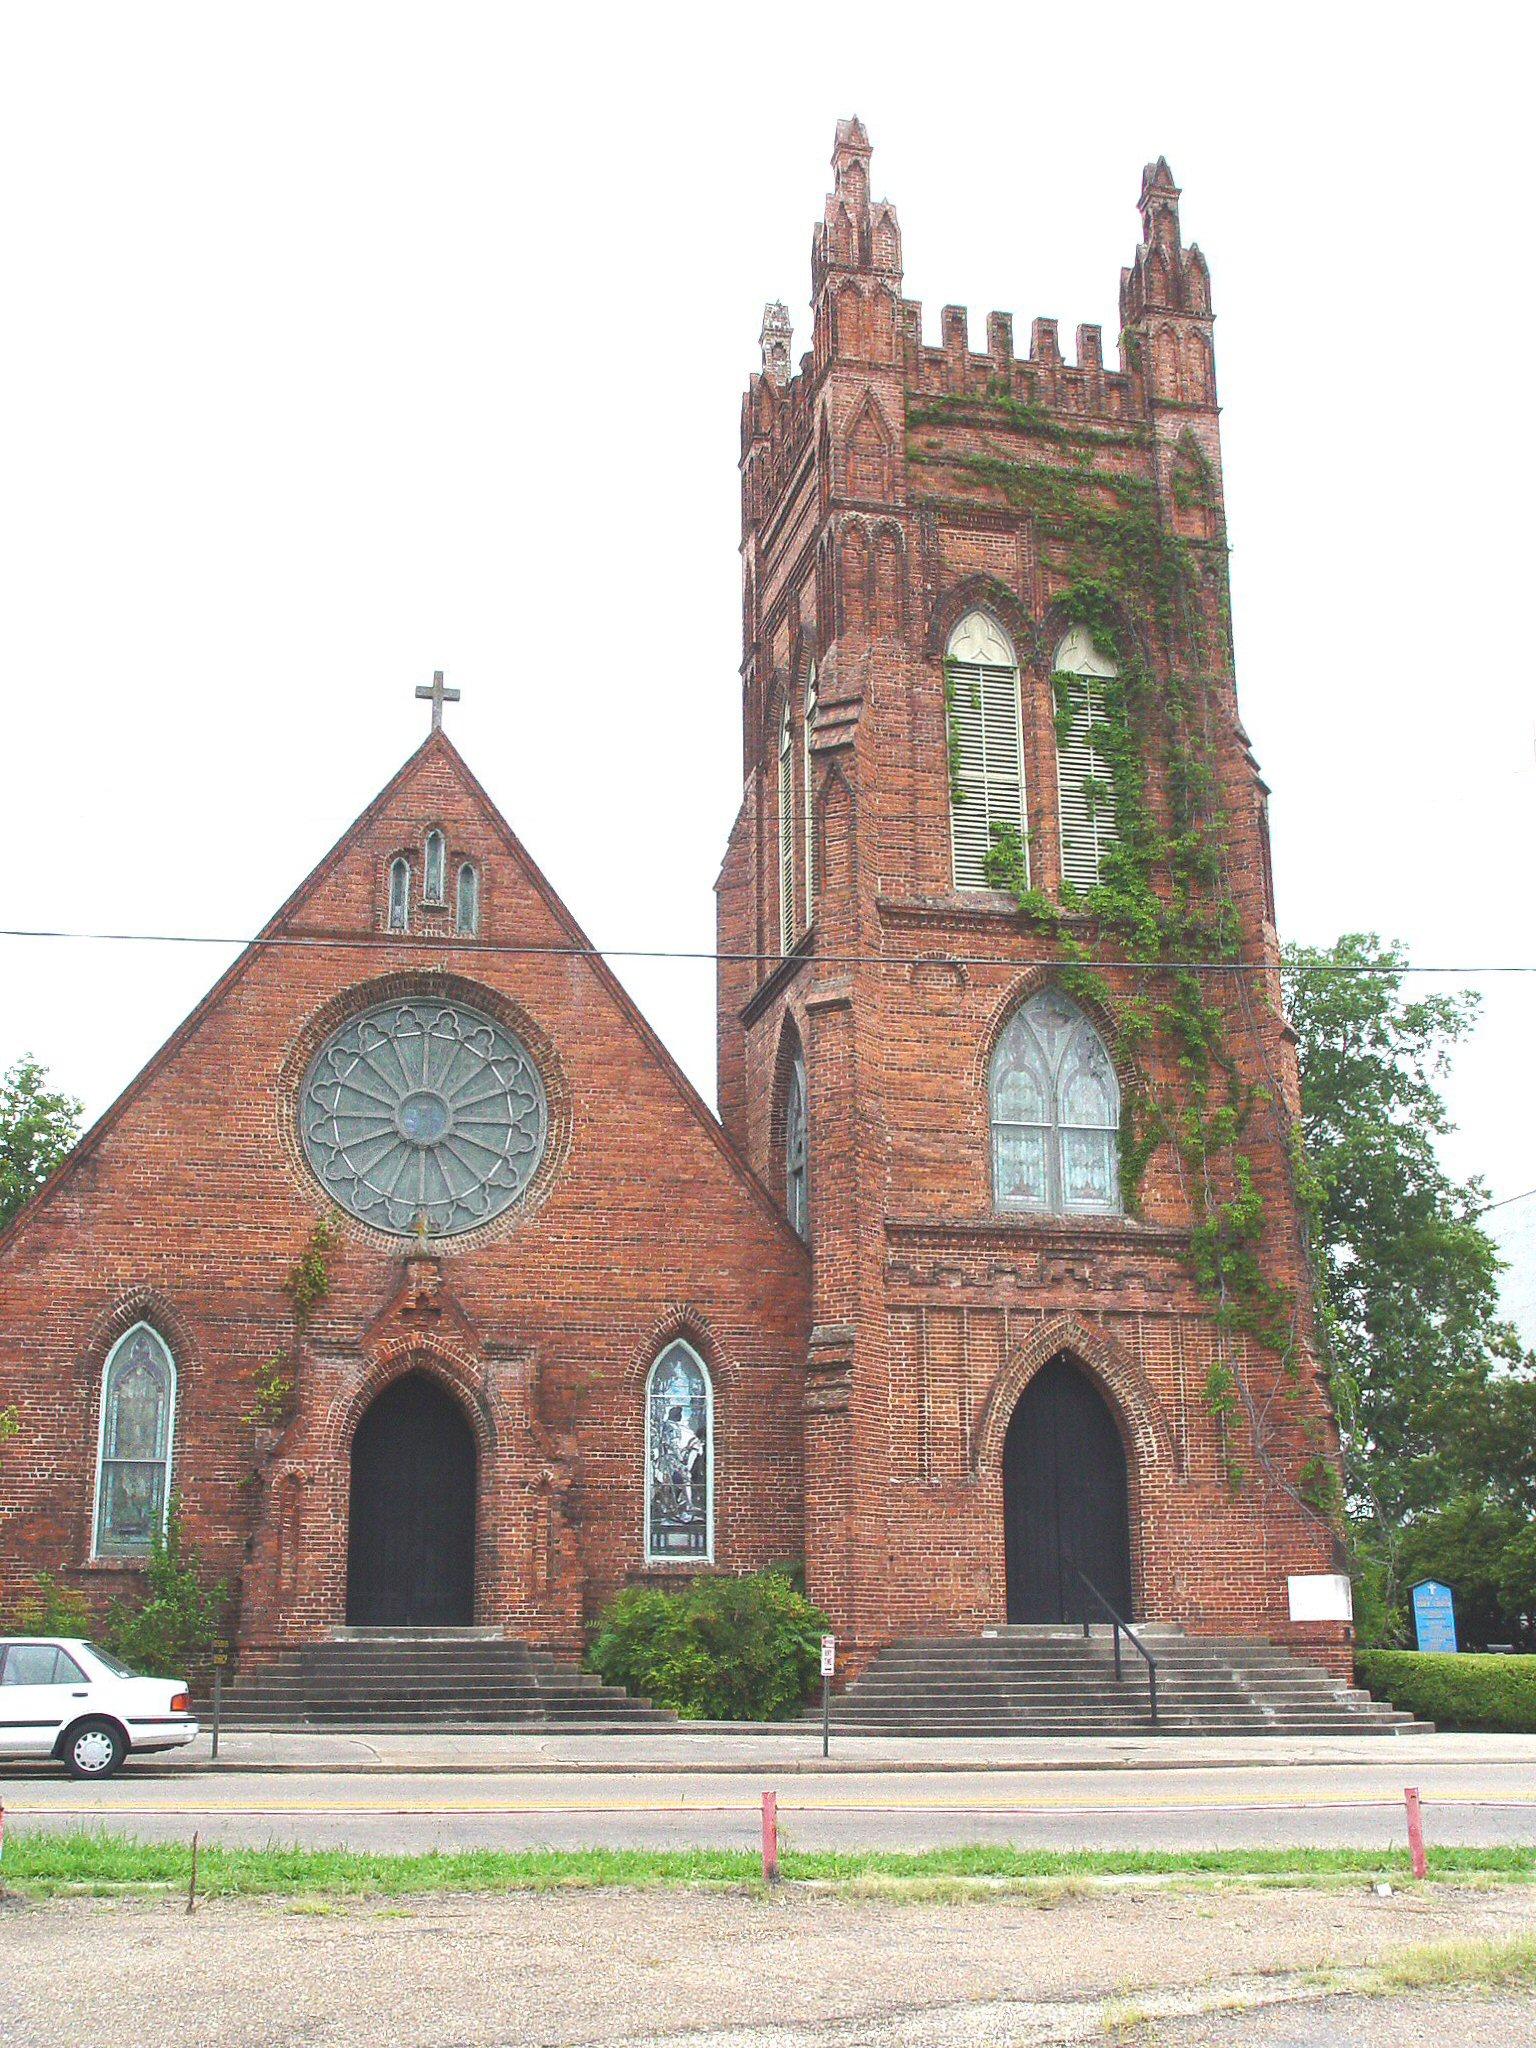 church shreveport episcopal louisiana st mark cross churches holy historic john bossier saint 1905 cathedral area methodist united history built